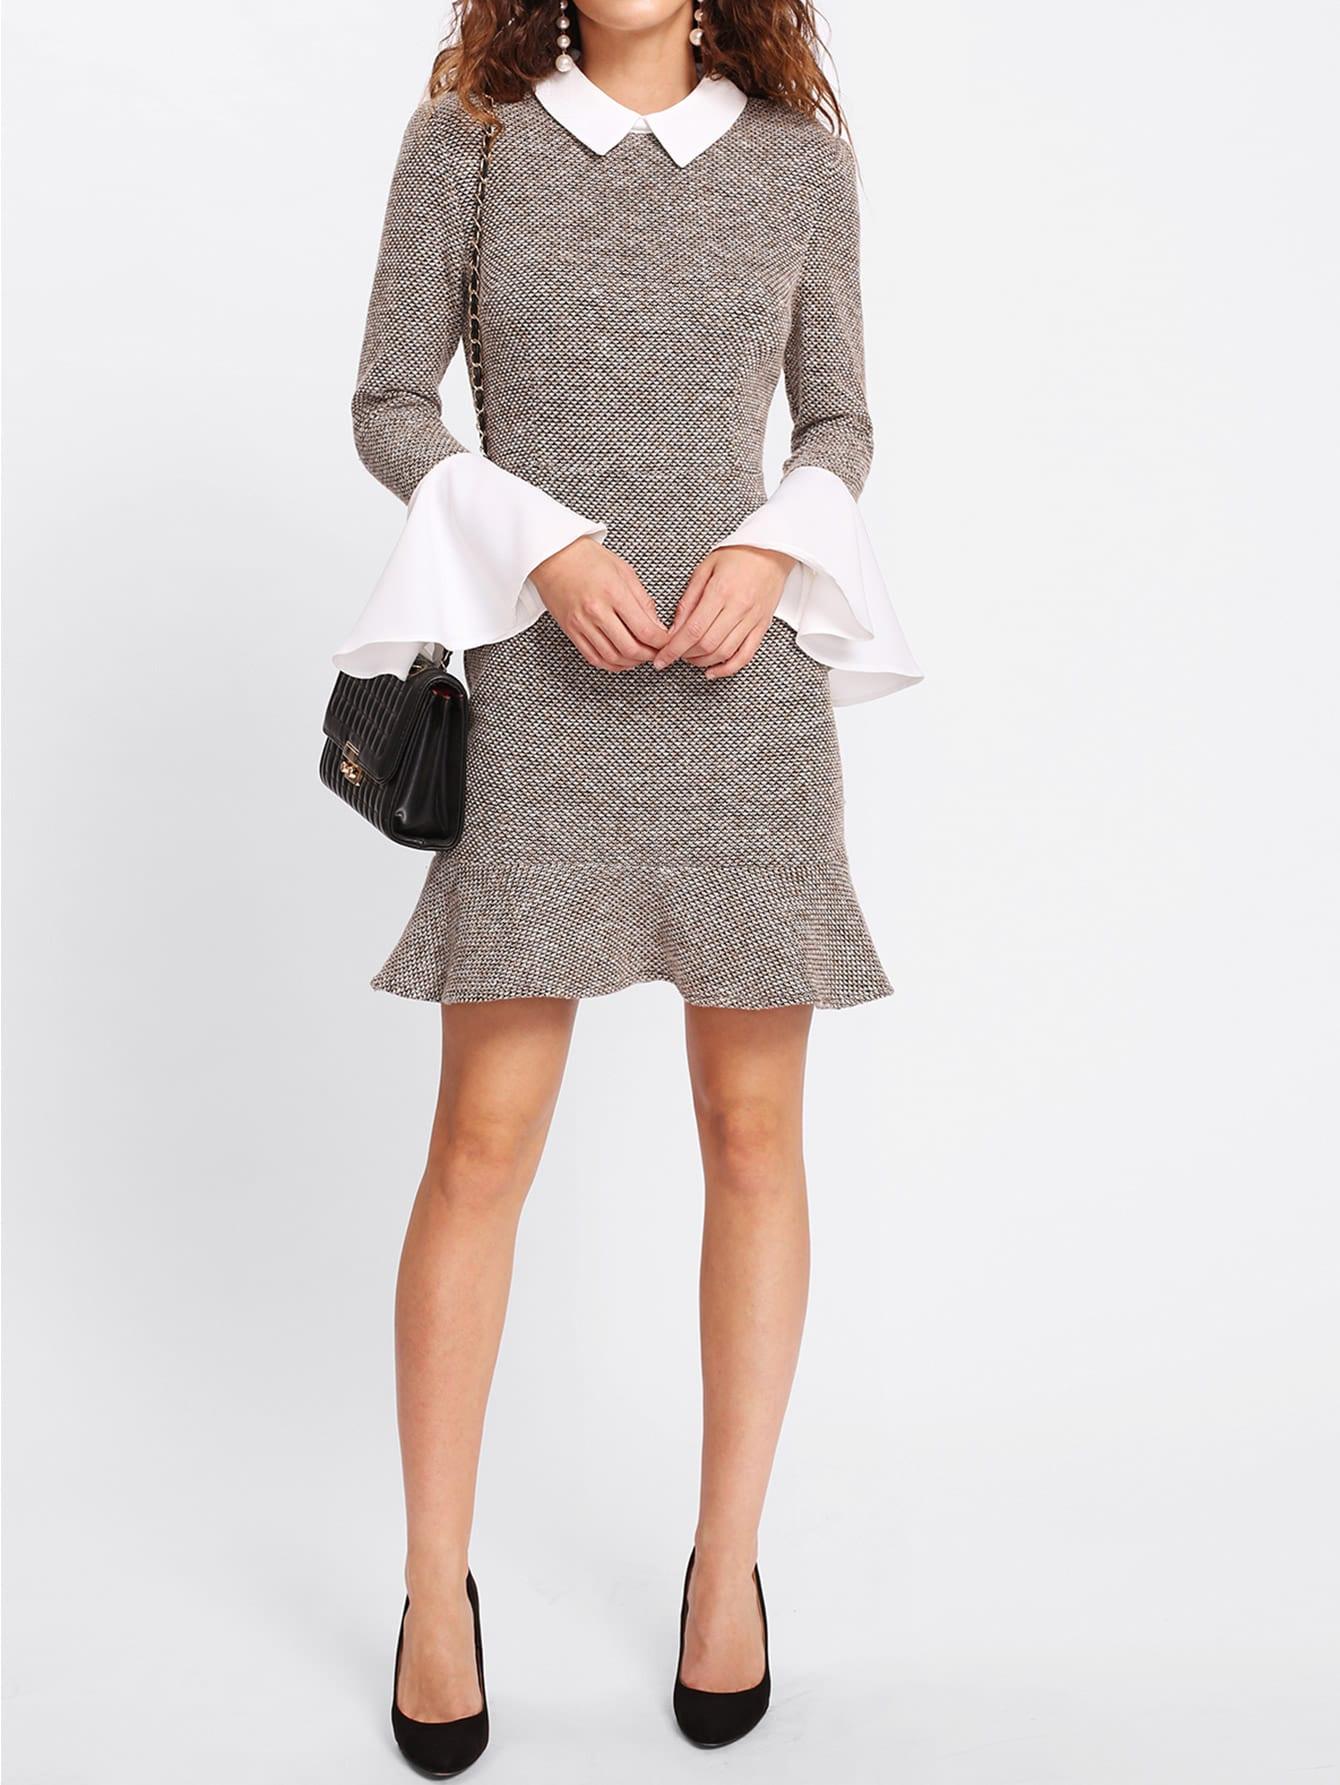 Contrast Collar And Ruffle Cuff Tweed Dress lace collar and cuff tunic dress